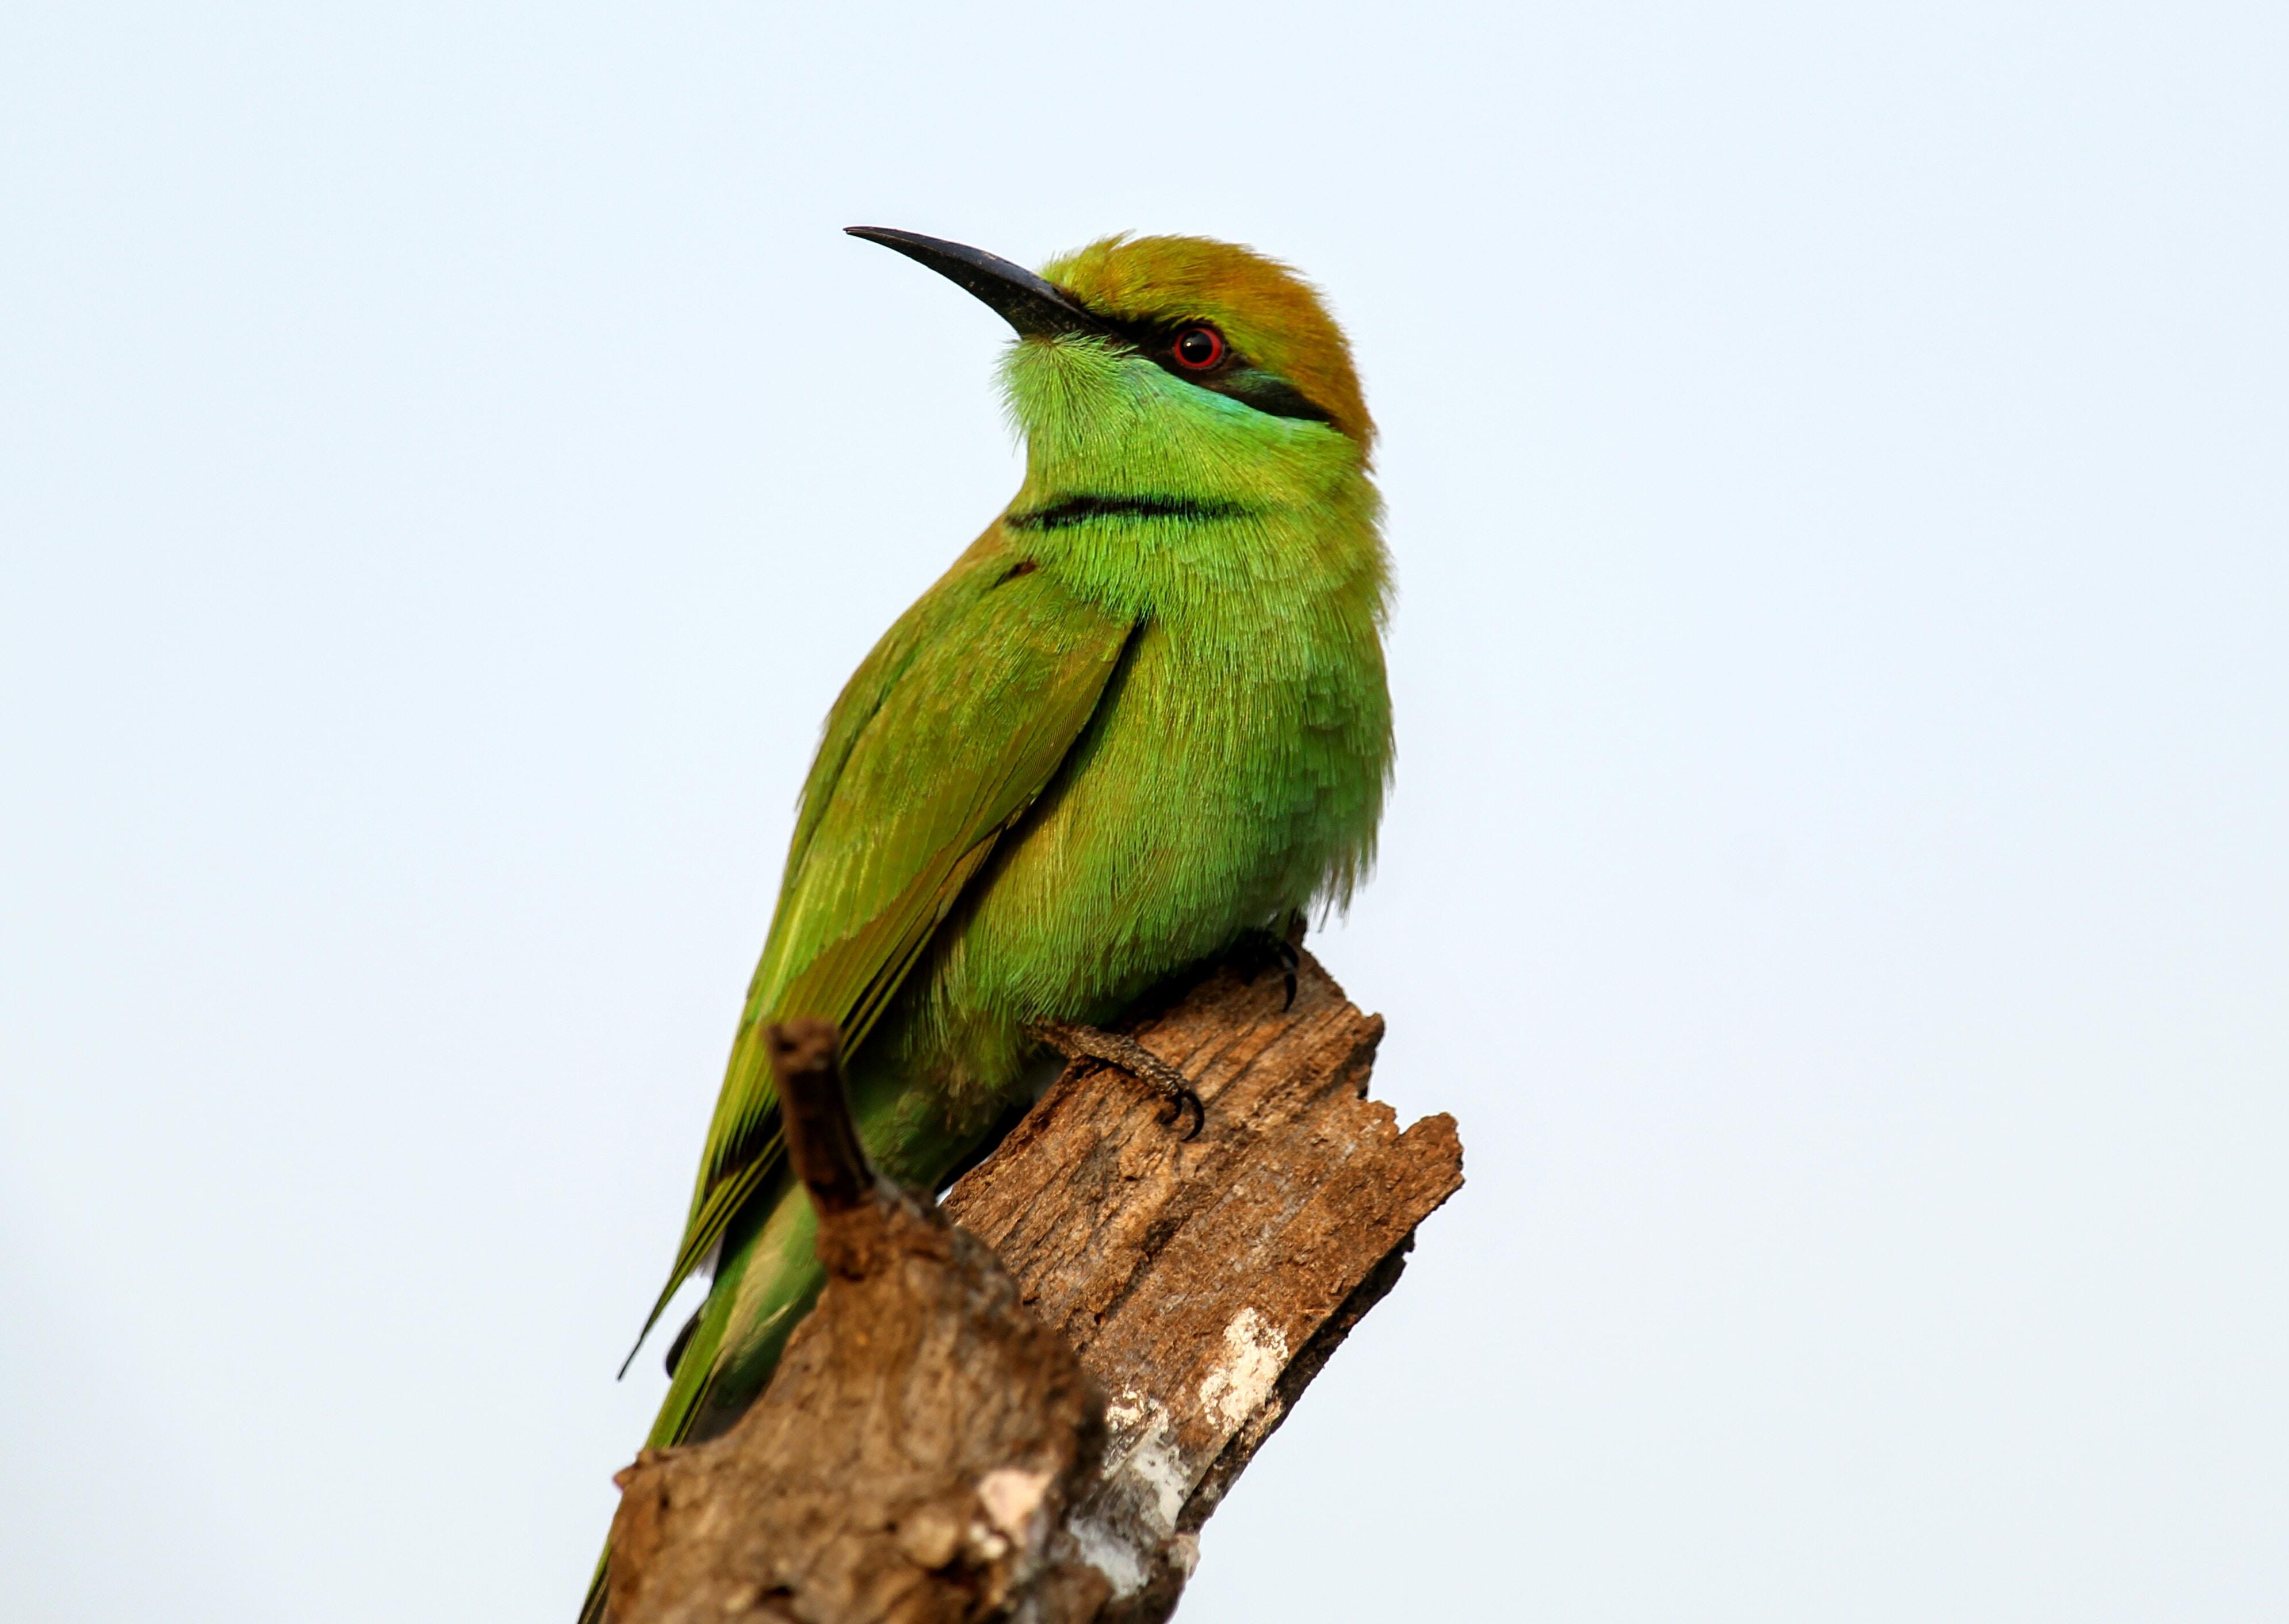 green and yellow bird plush toy